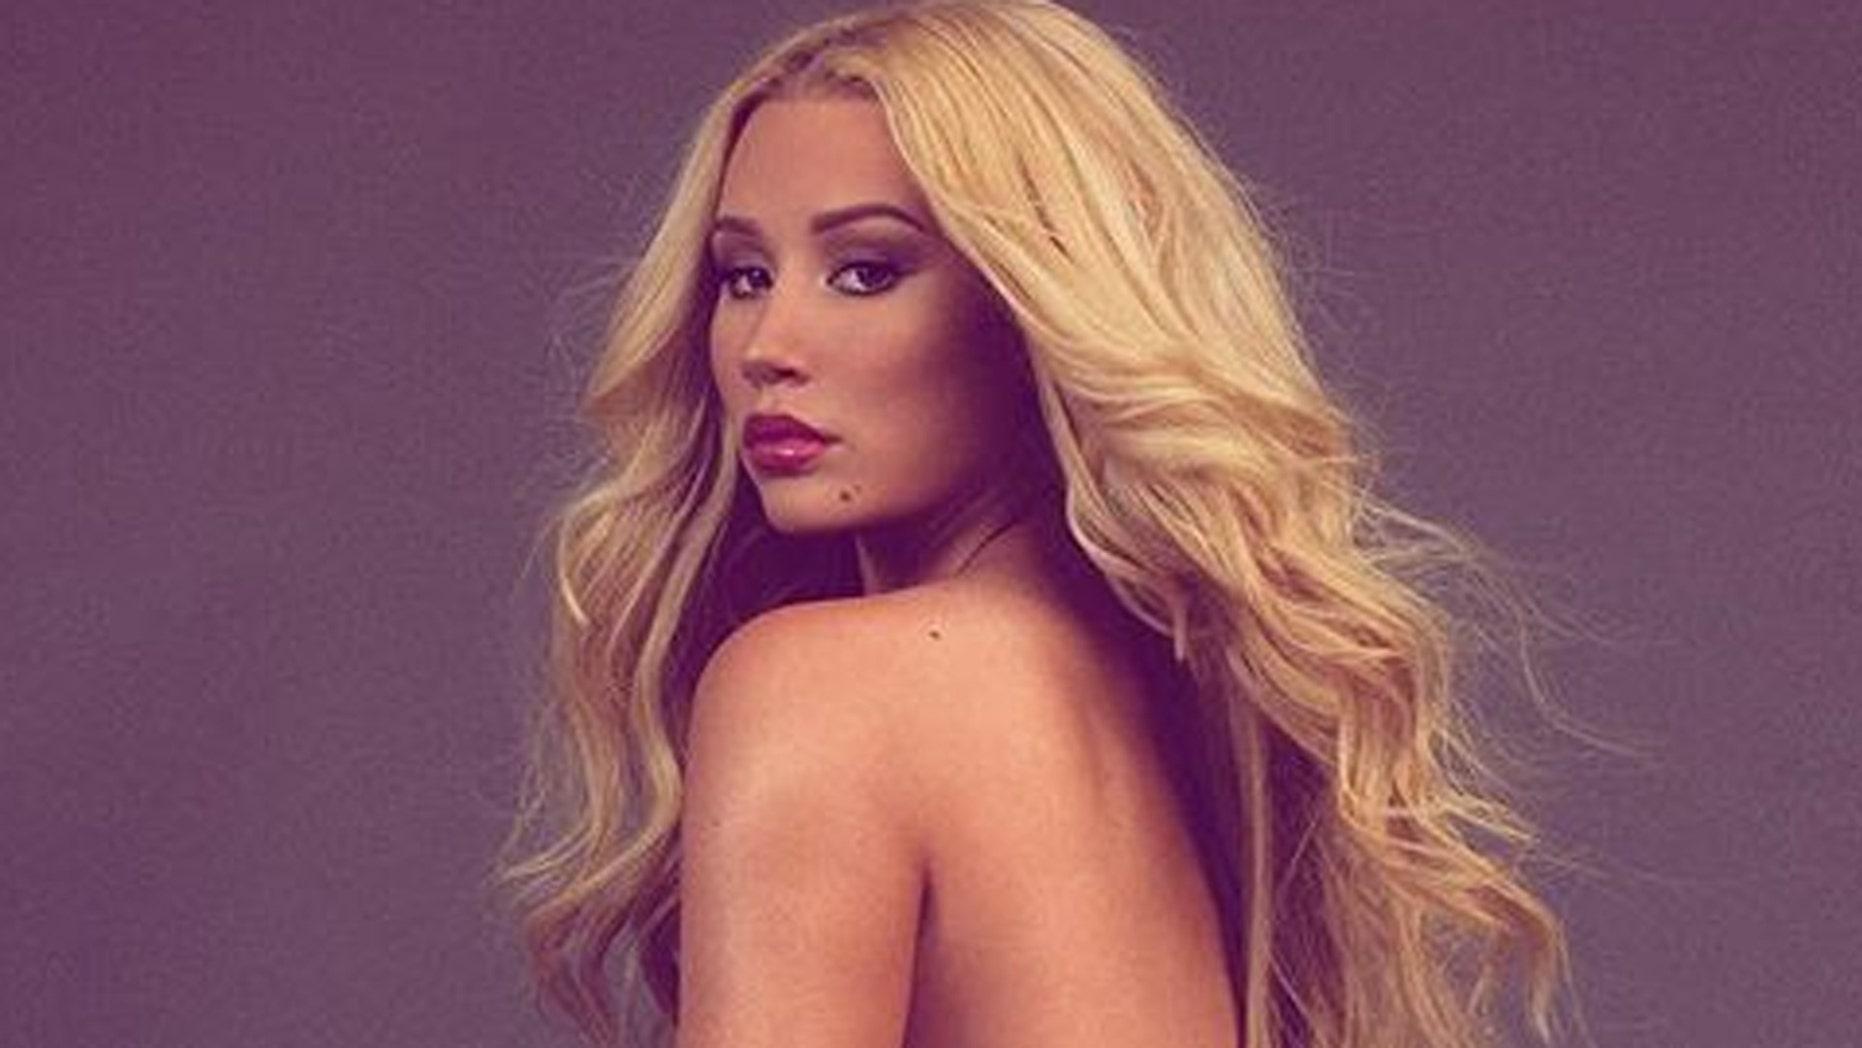 Xxx Miley cyrus eyebrows rare nudes kim novak jessica